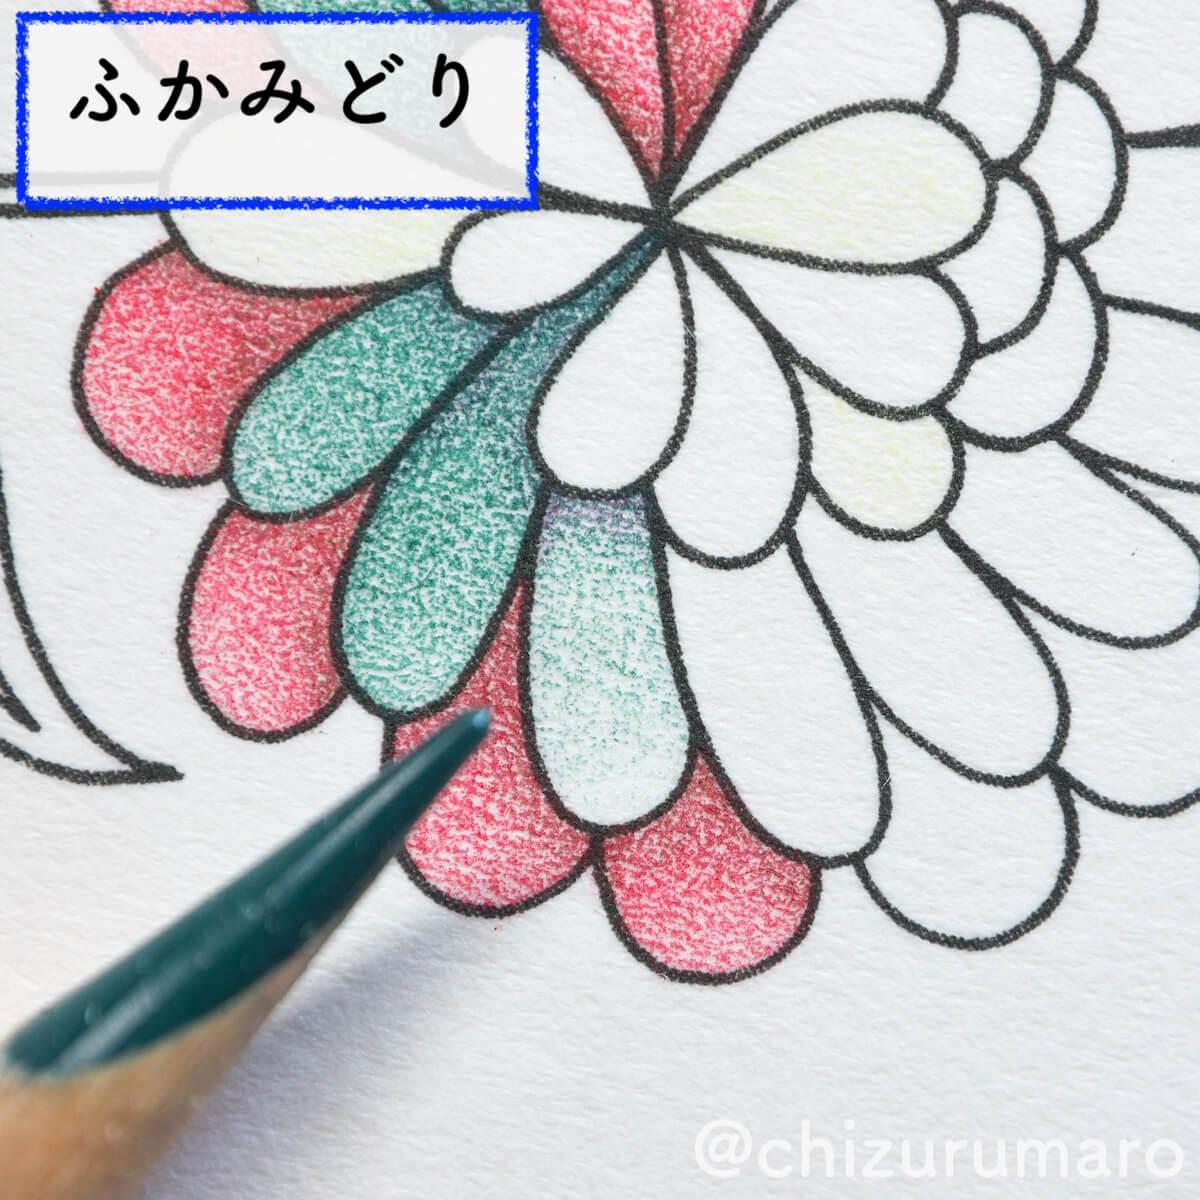 f:id:chizurumaro:20200511124952j:plain